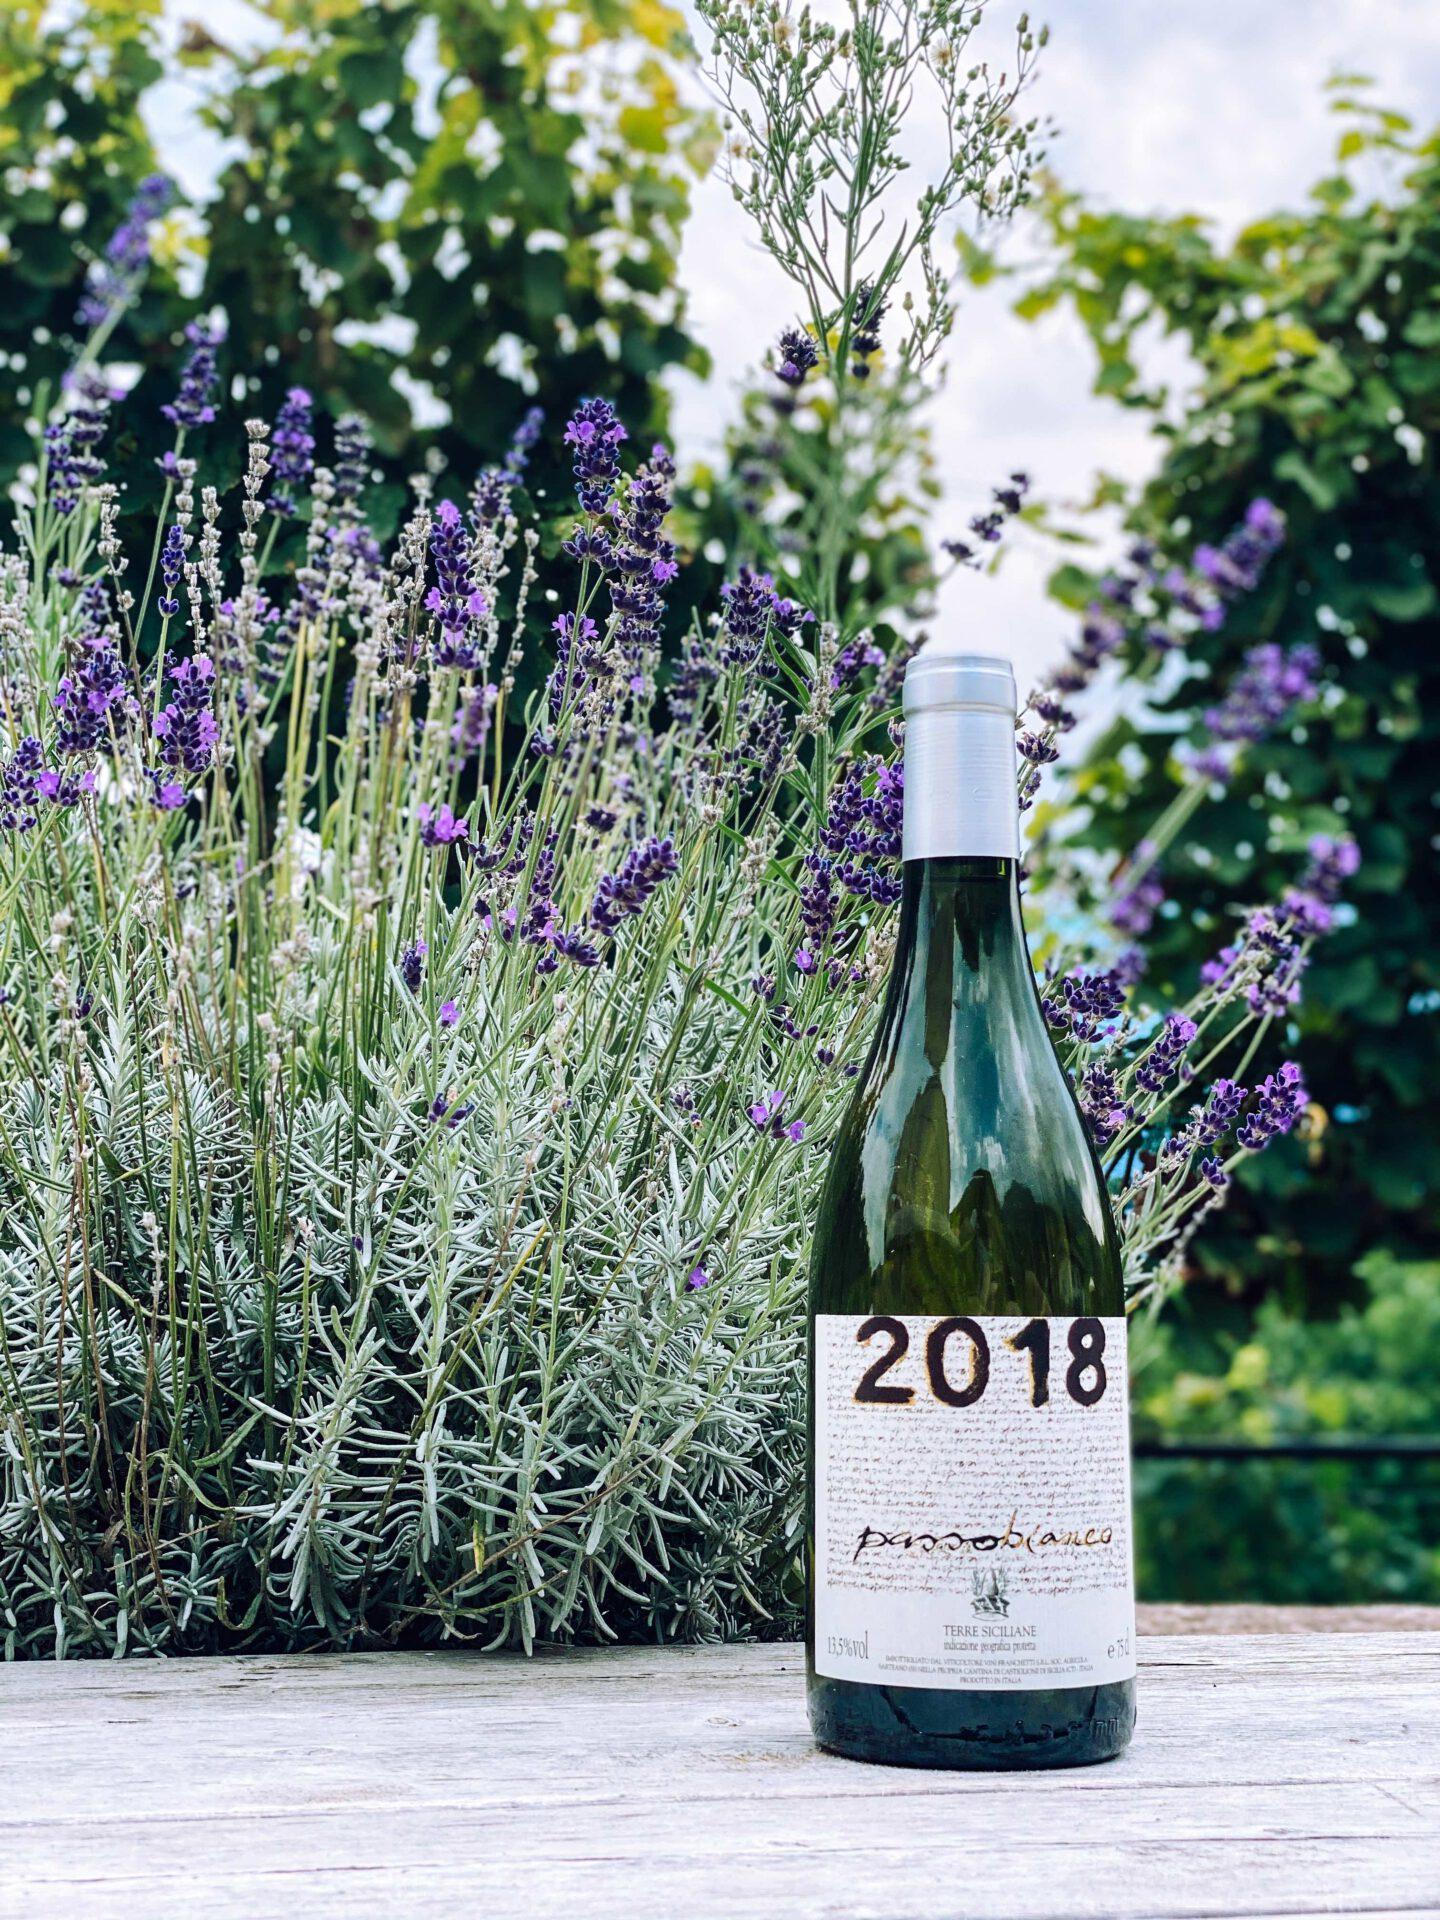 passobianco white wine italy